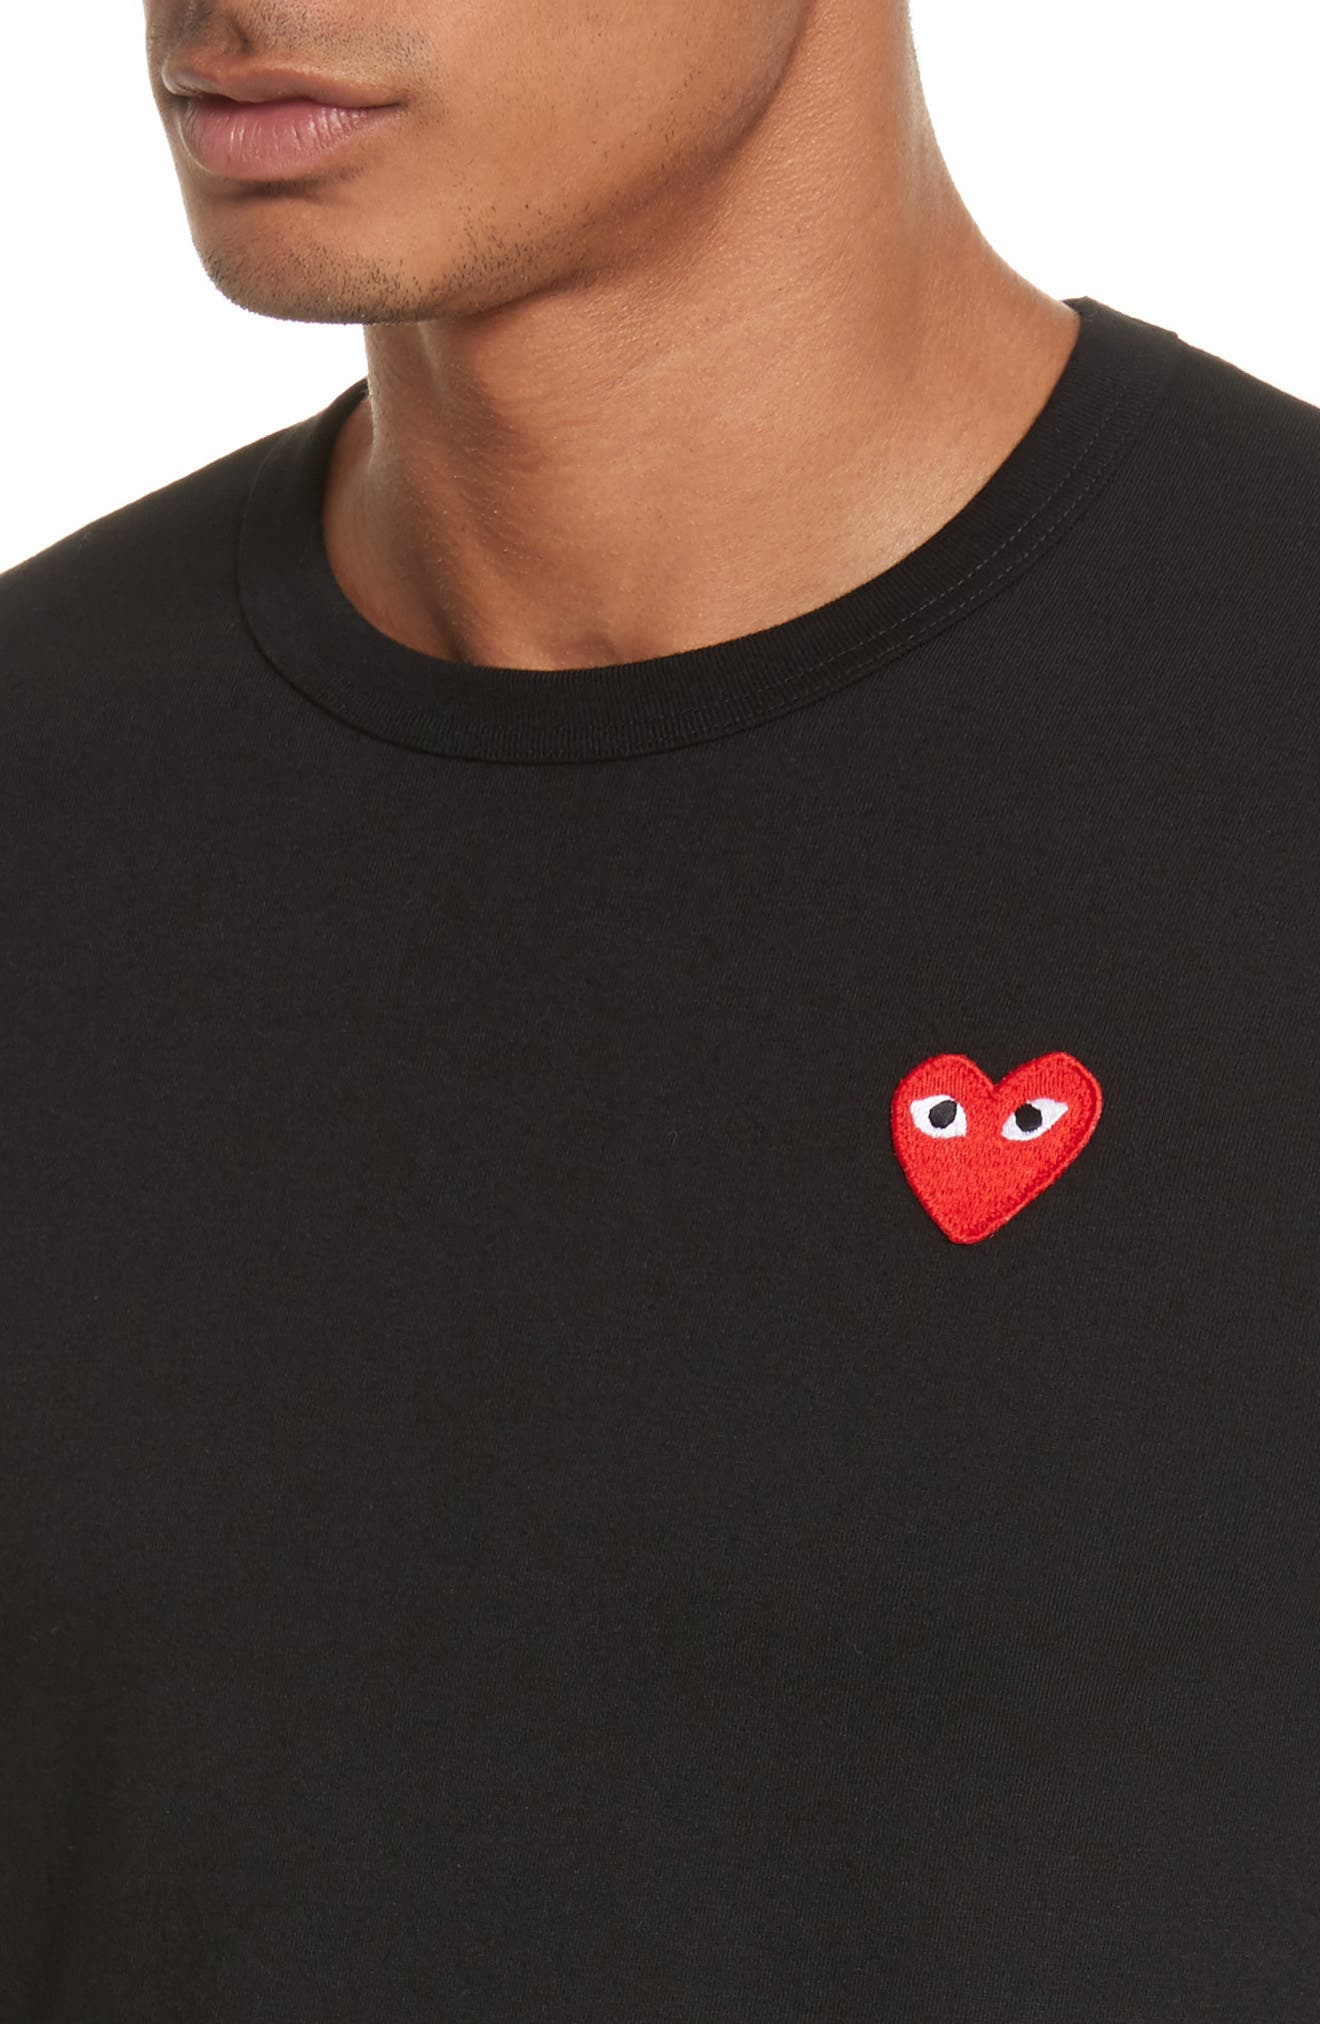 Long Sleeve T-Shirt,                             Alternate thumbnail 4, color,                             BLACK